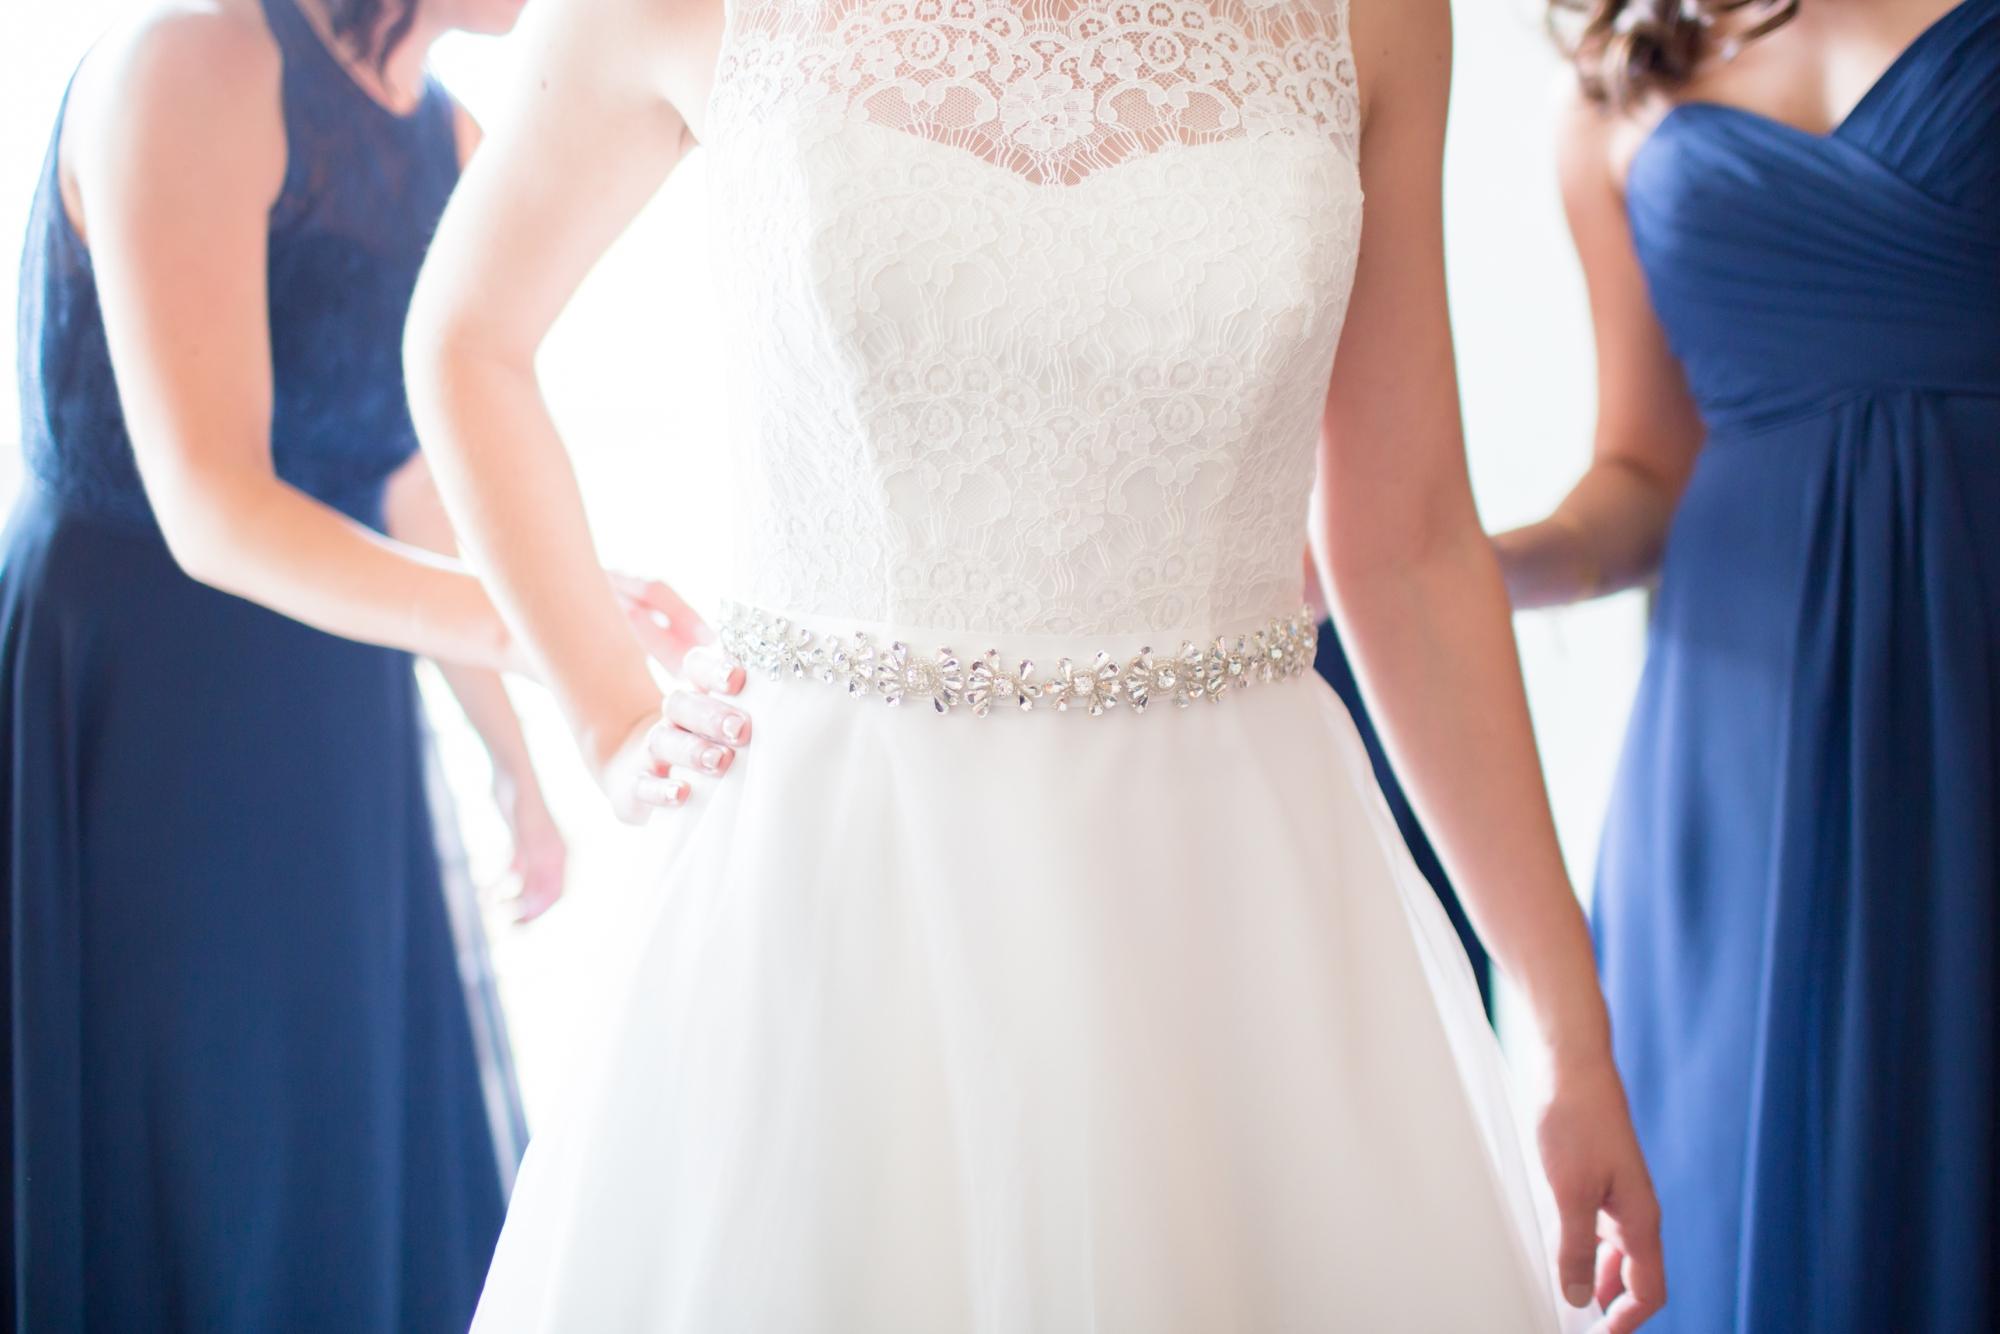 1-Finkel Wedding Getting Ready-127_anna grace photography maryland wedding photographer turf valley.jpg